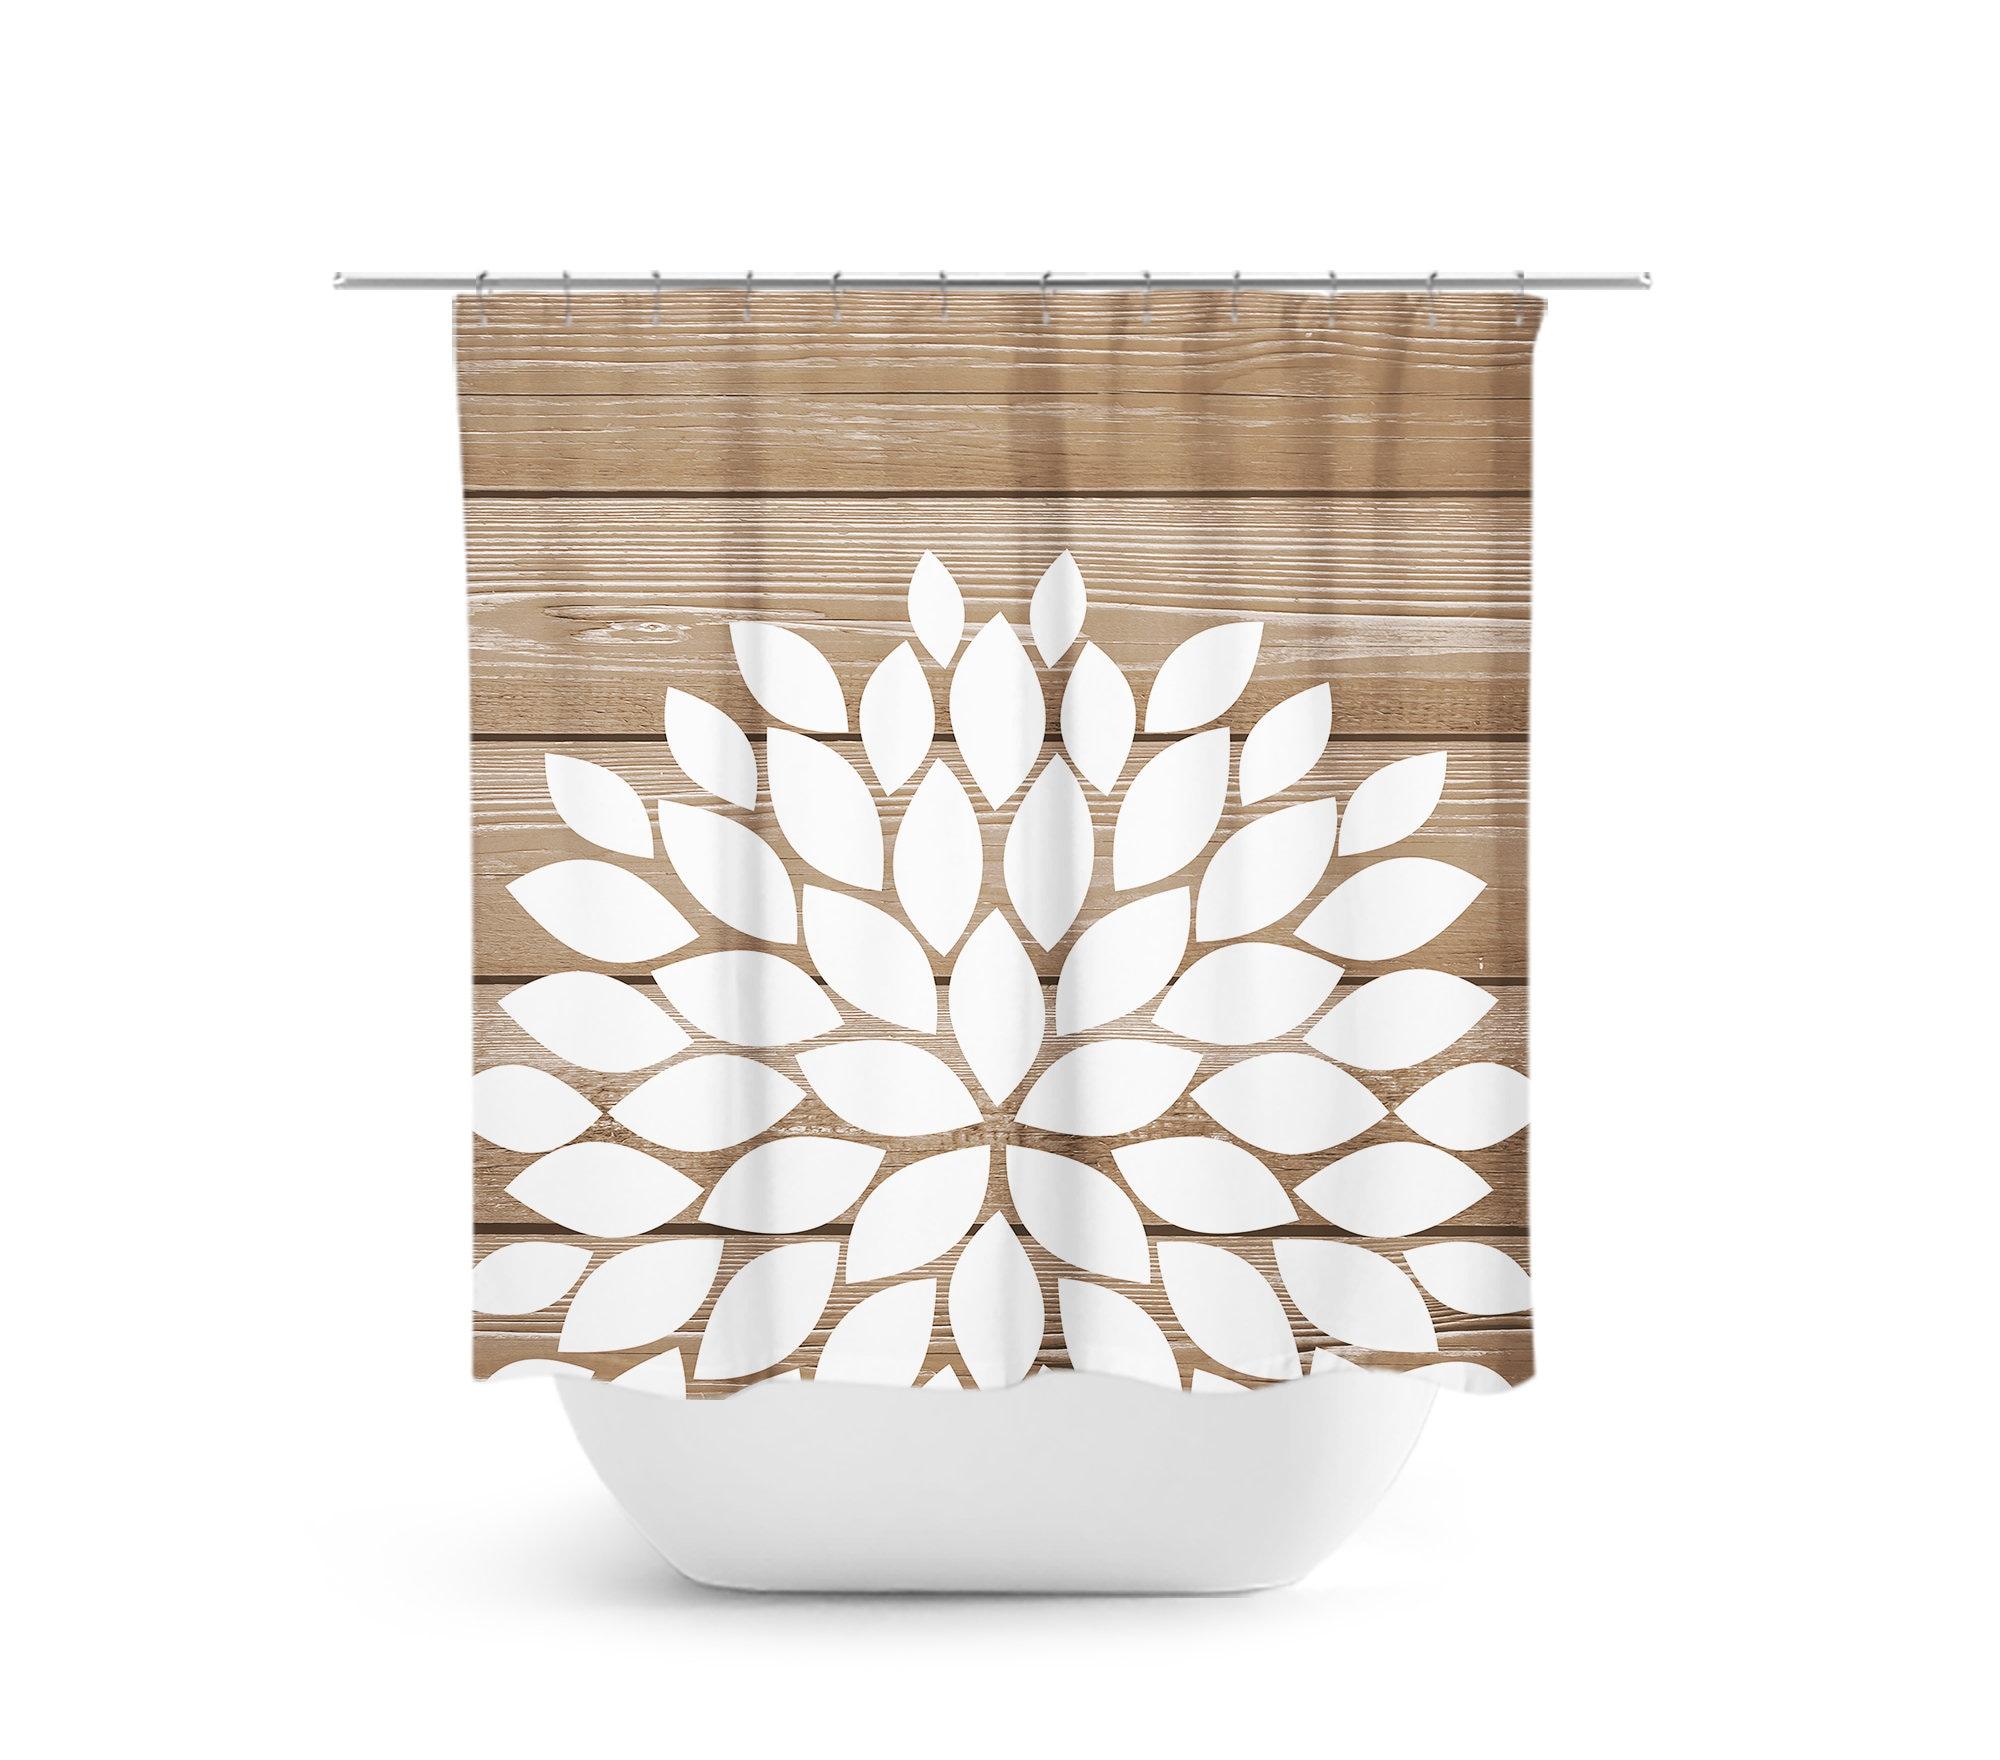 Flower Shower Curtain Tan And White Bathroom Decor